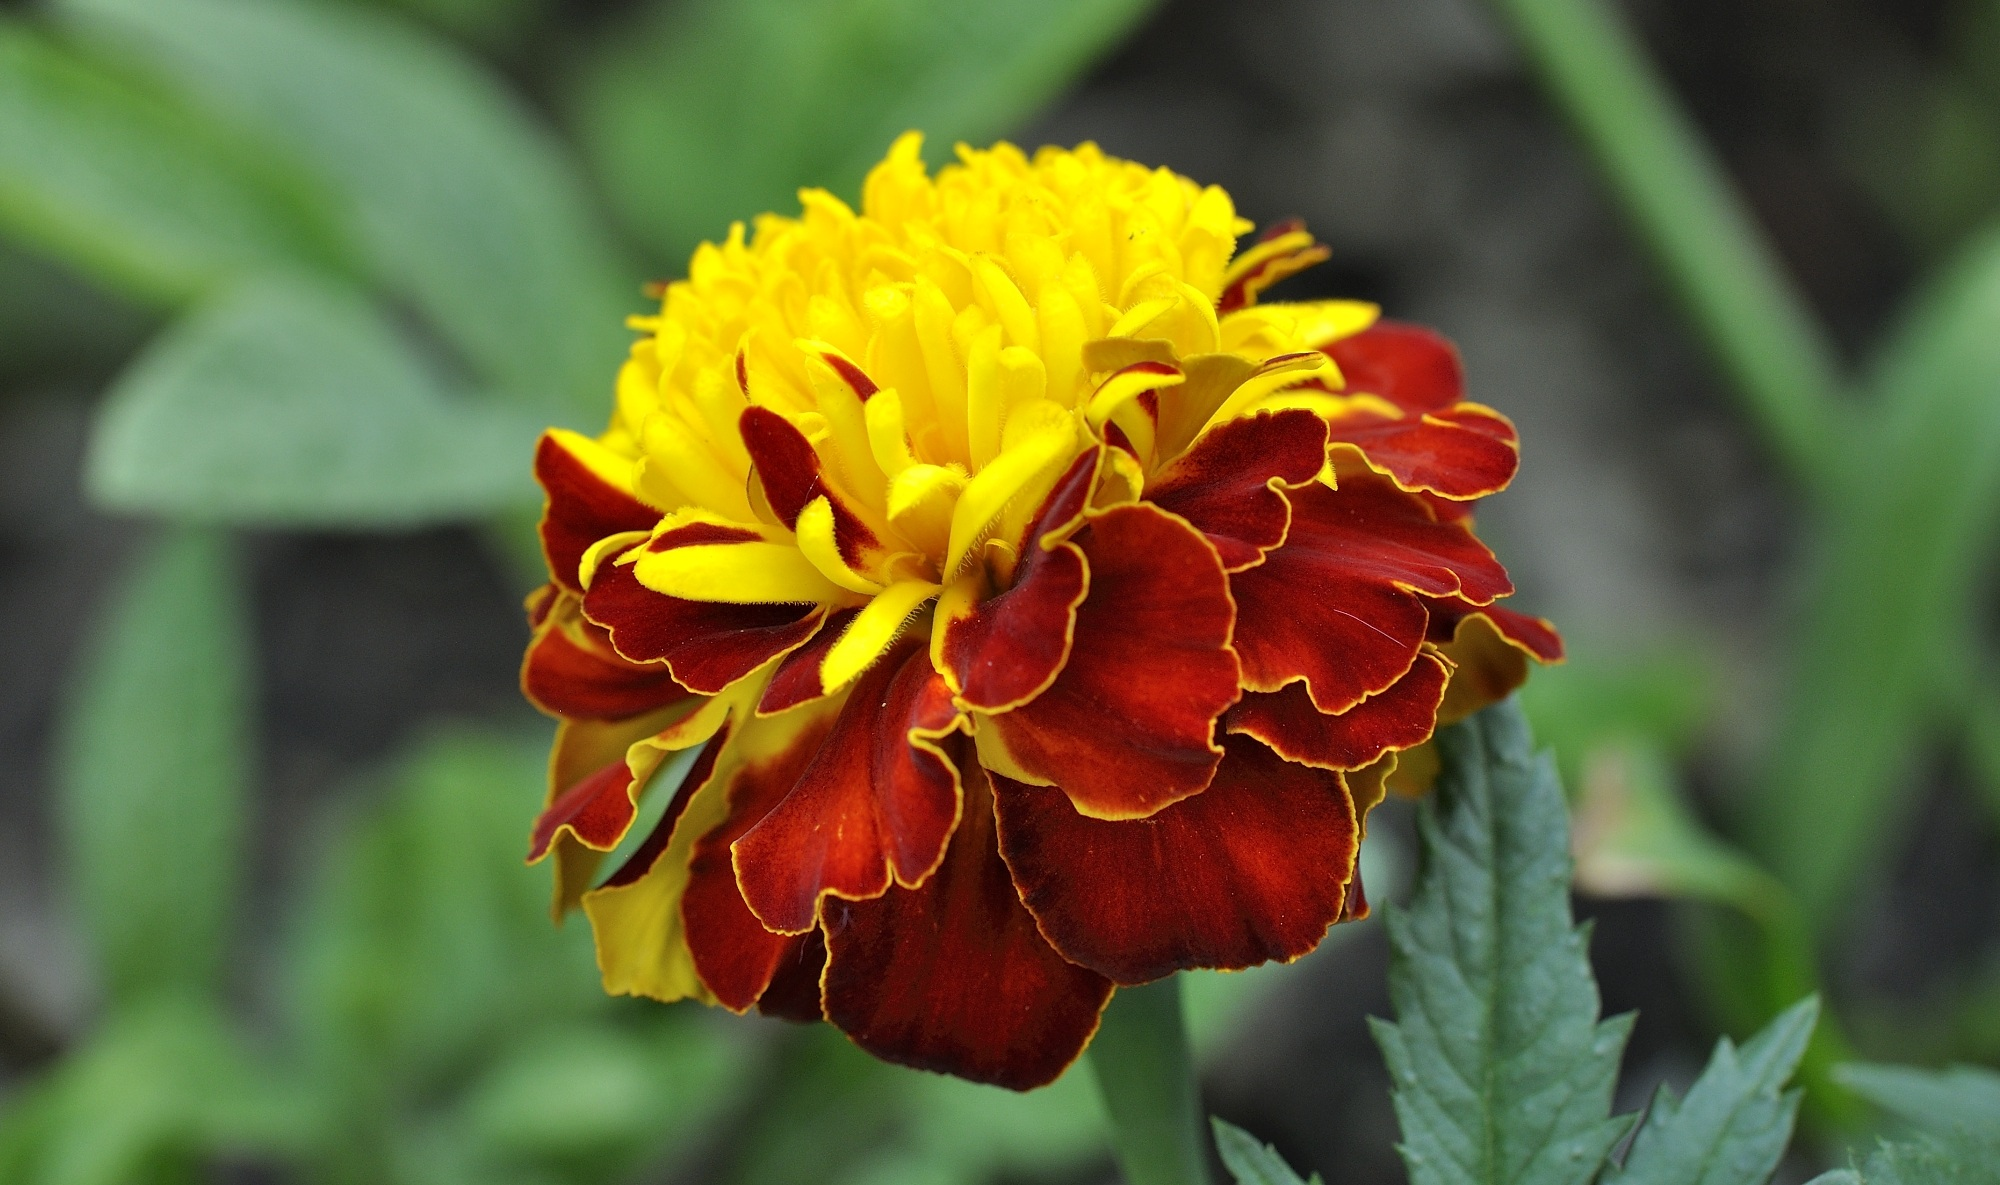 Red Yellow Carnation Flower Blossom Garden Free Image